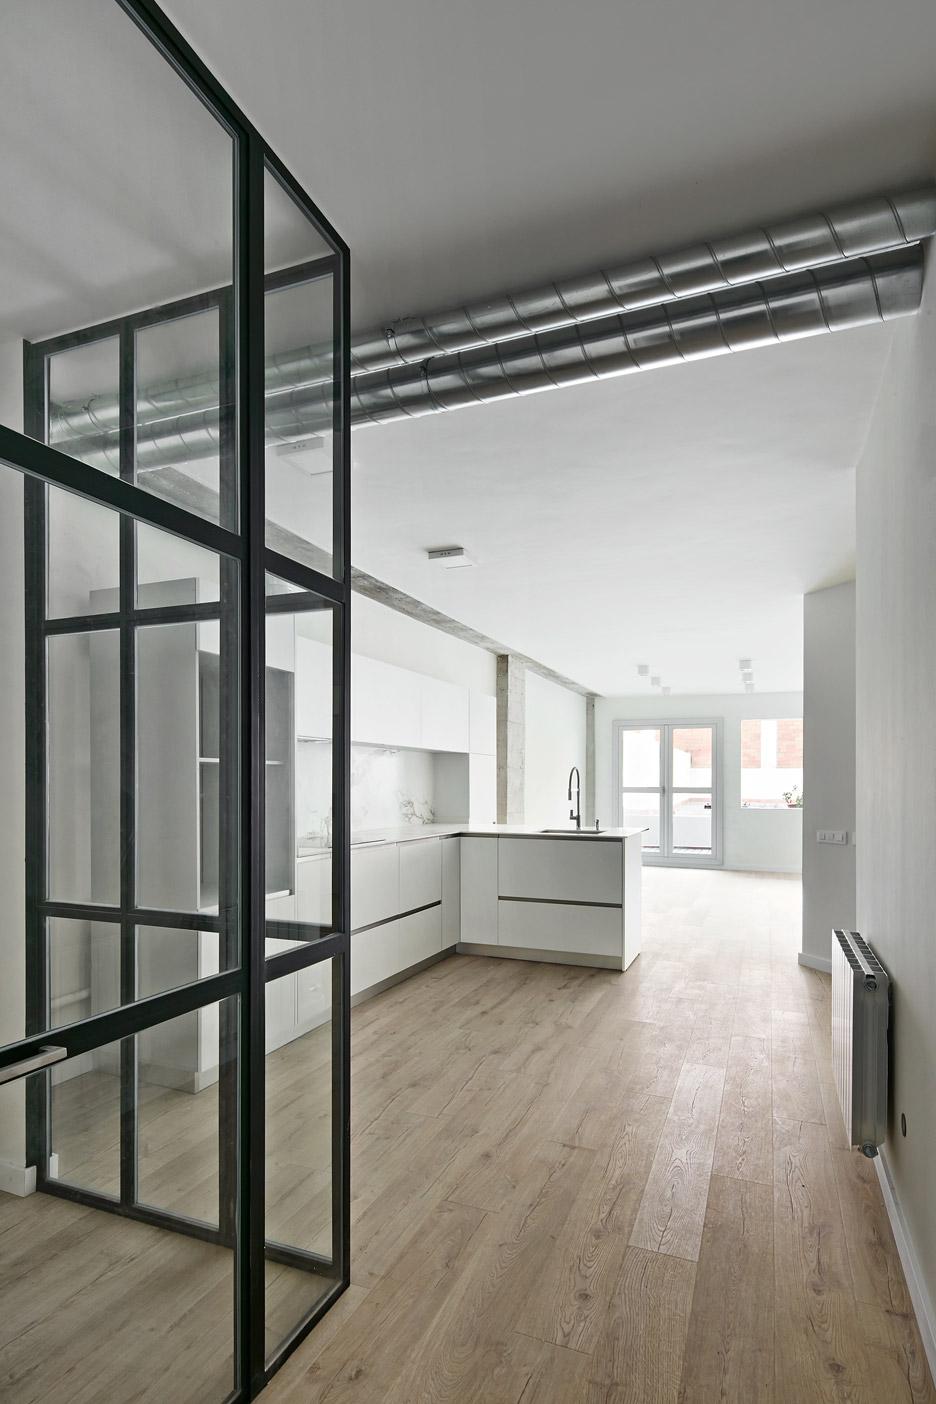 architecture_ open_layout__design_studia_interiors_osnovadesign_osnova_poltava_03